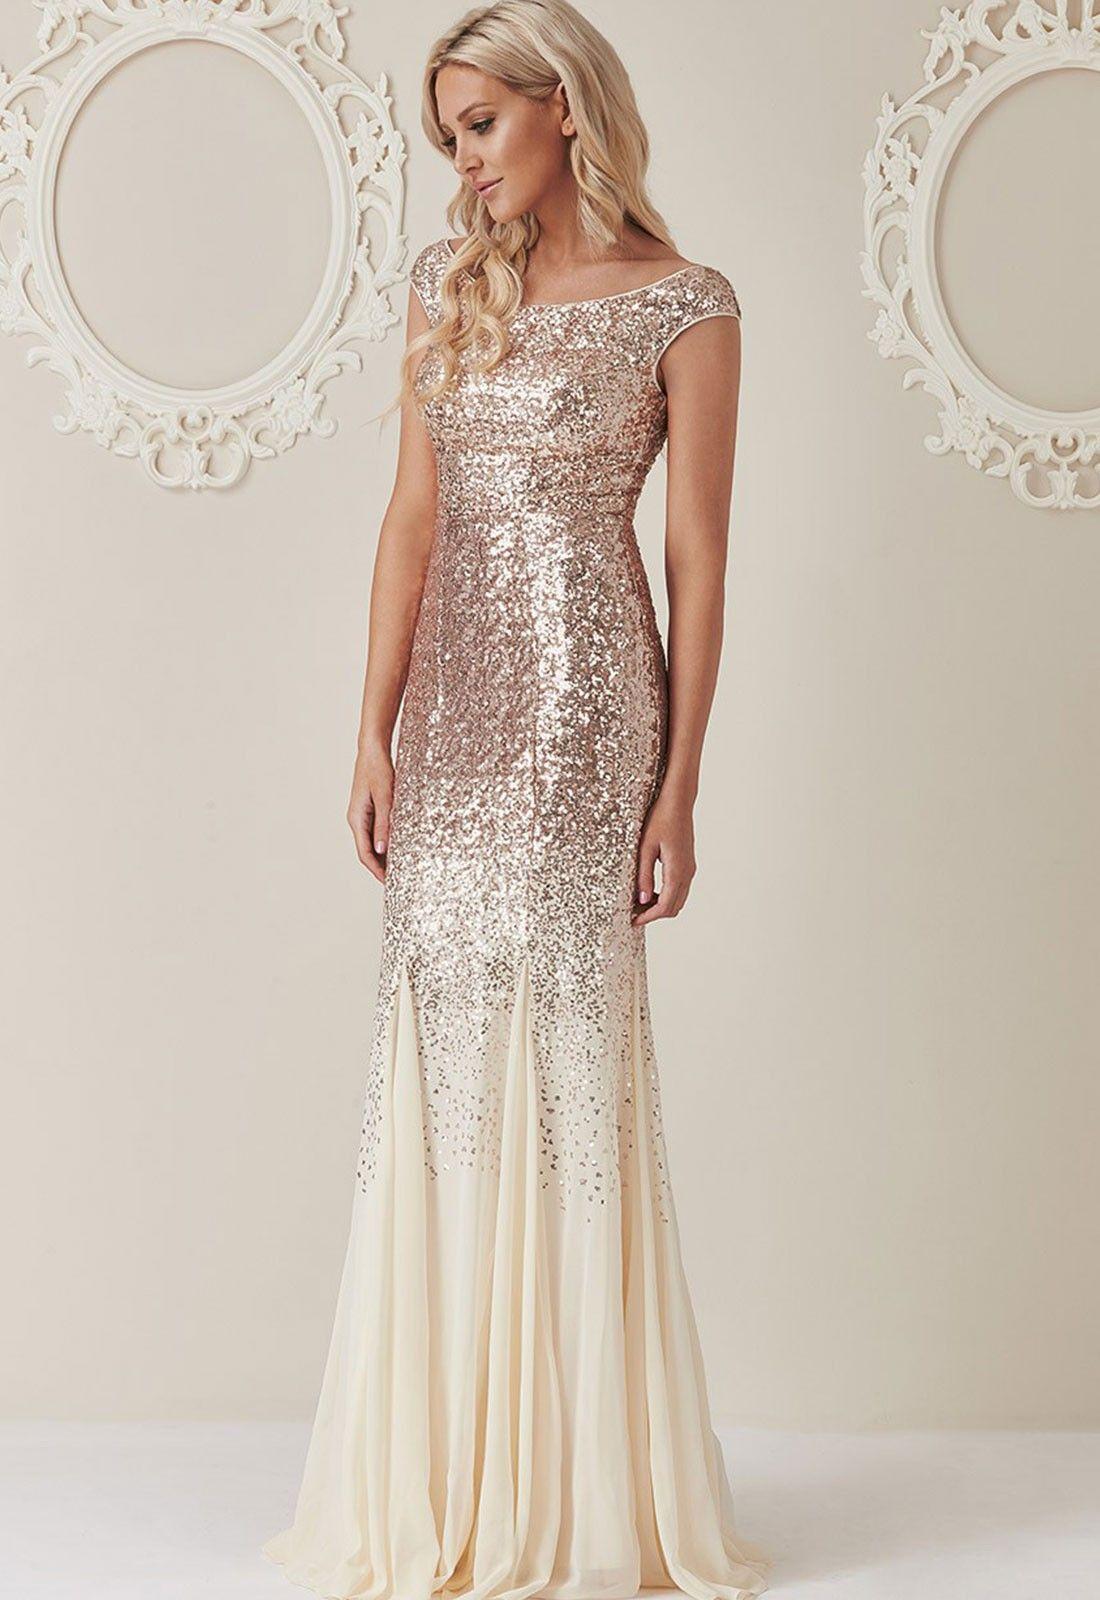 Stephanie pratt sequin and chiffon maxi dress in champagne full